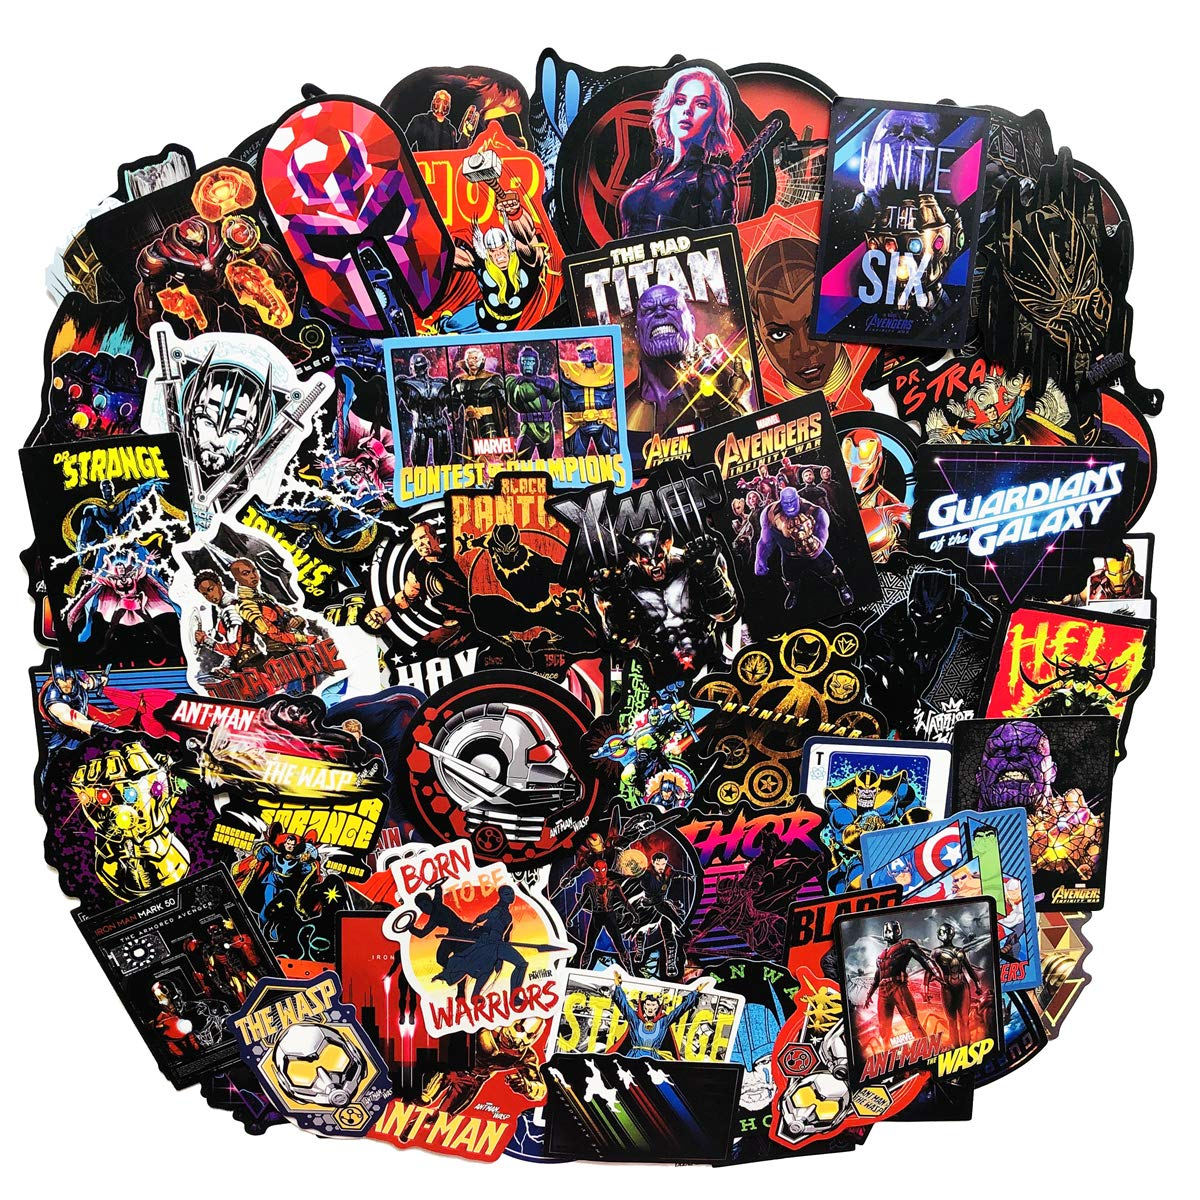 Stickers Calcos 108 un. Superheroes Origen U.S.A. (7KWVRKS8)